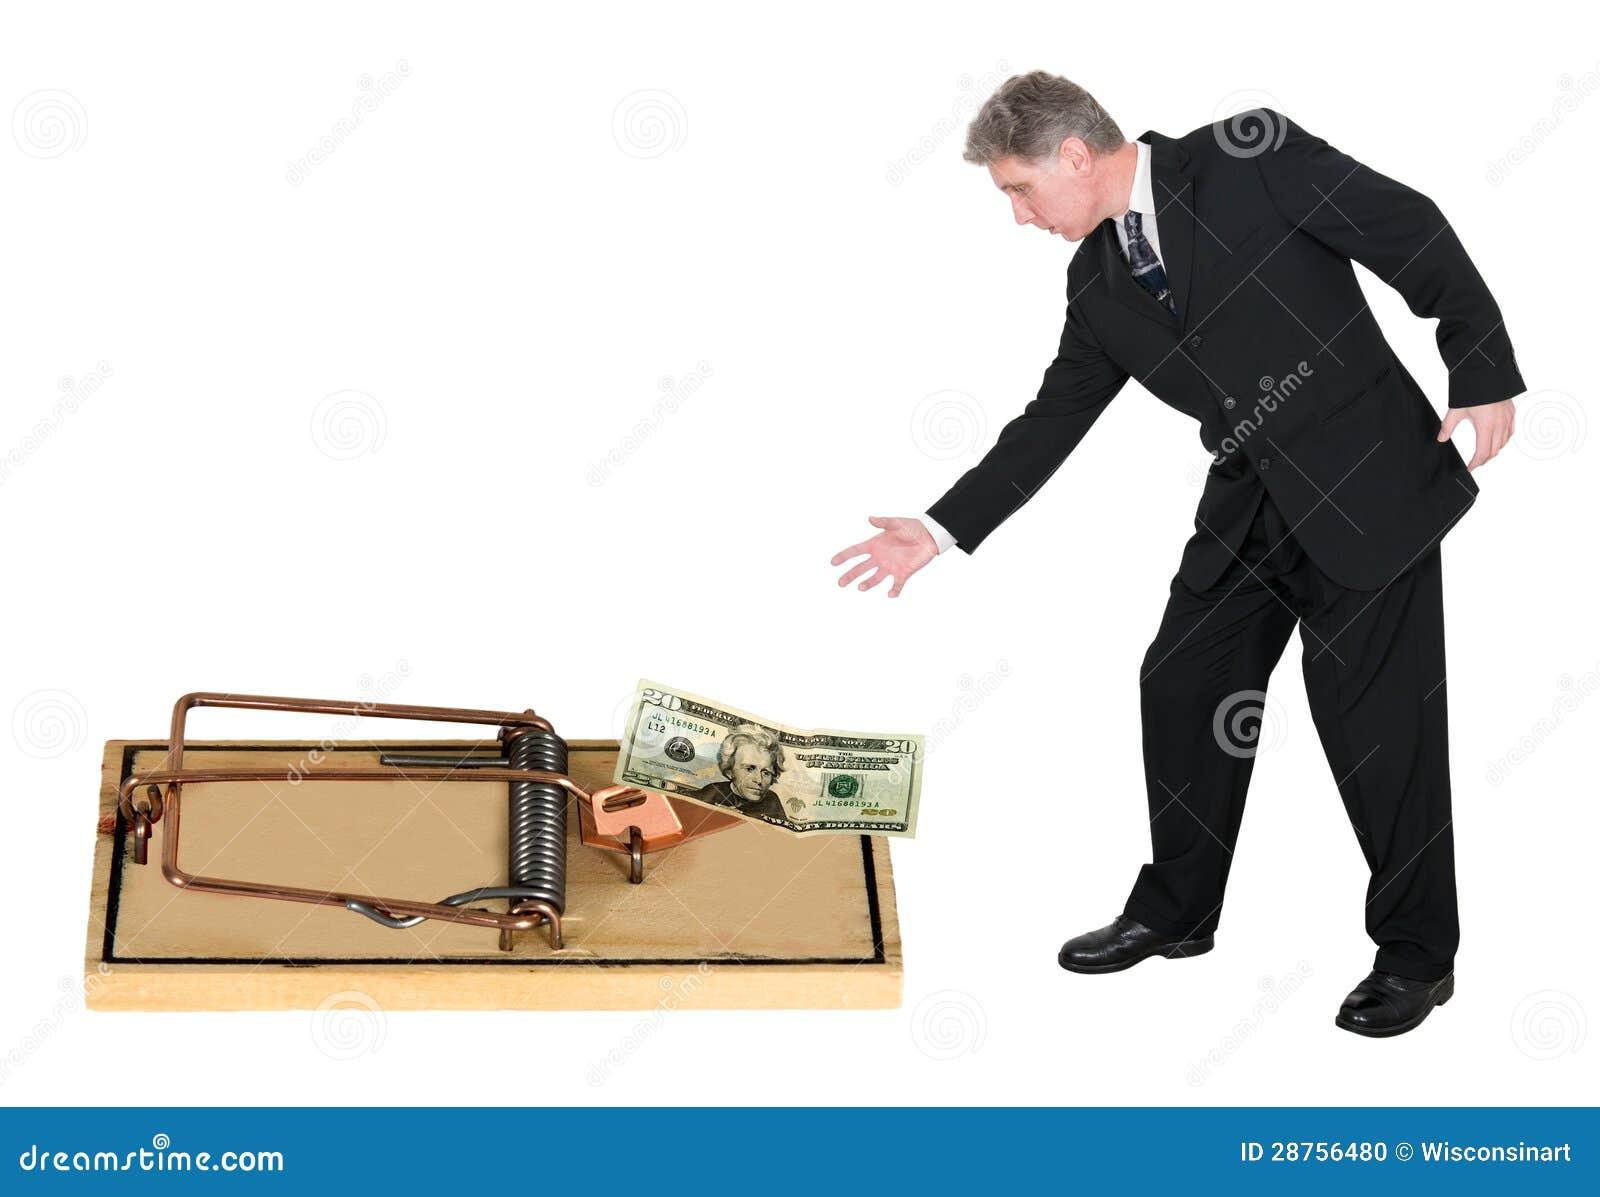 Risco, conceito da avidez para o negócio, vendas, mercado